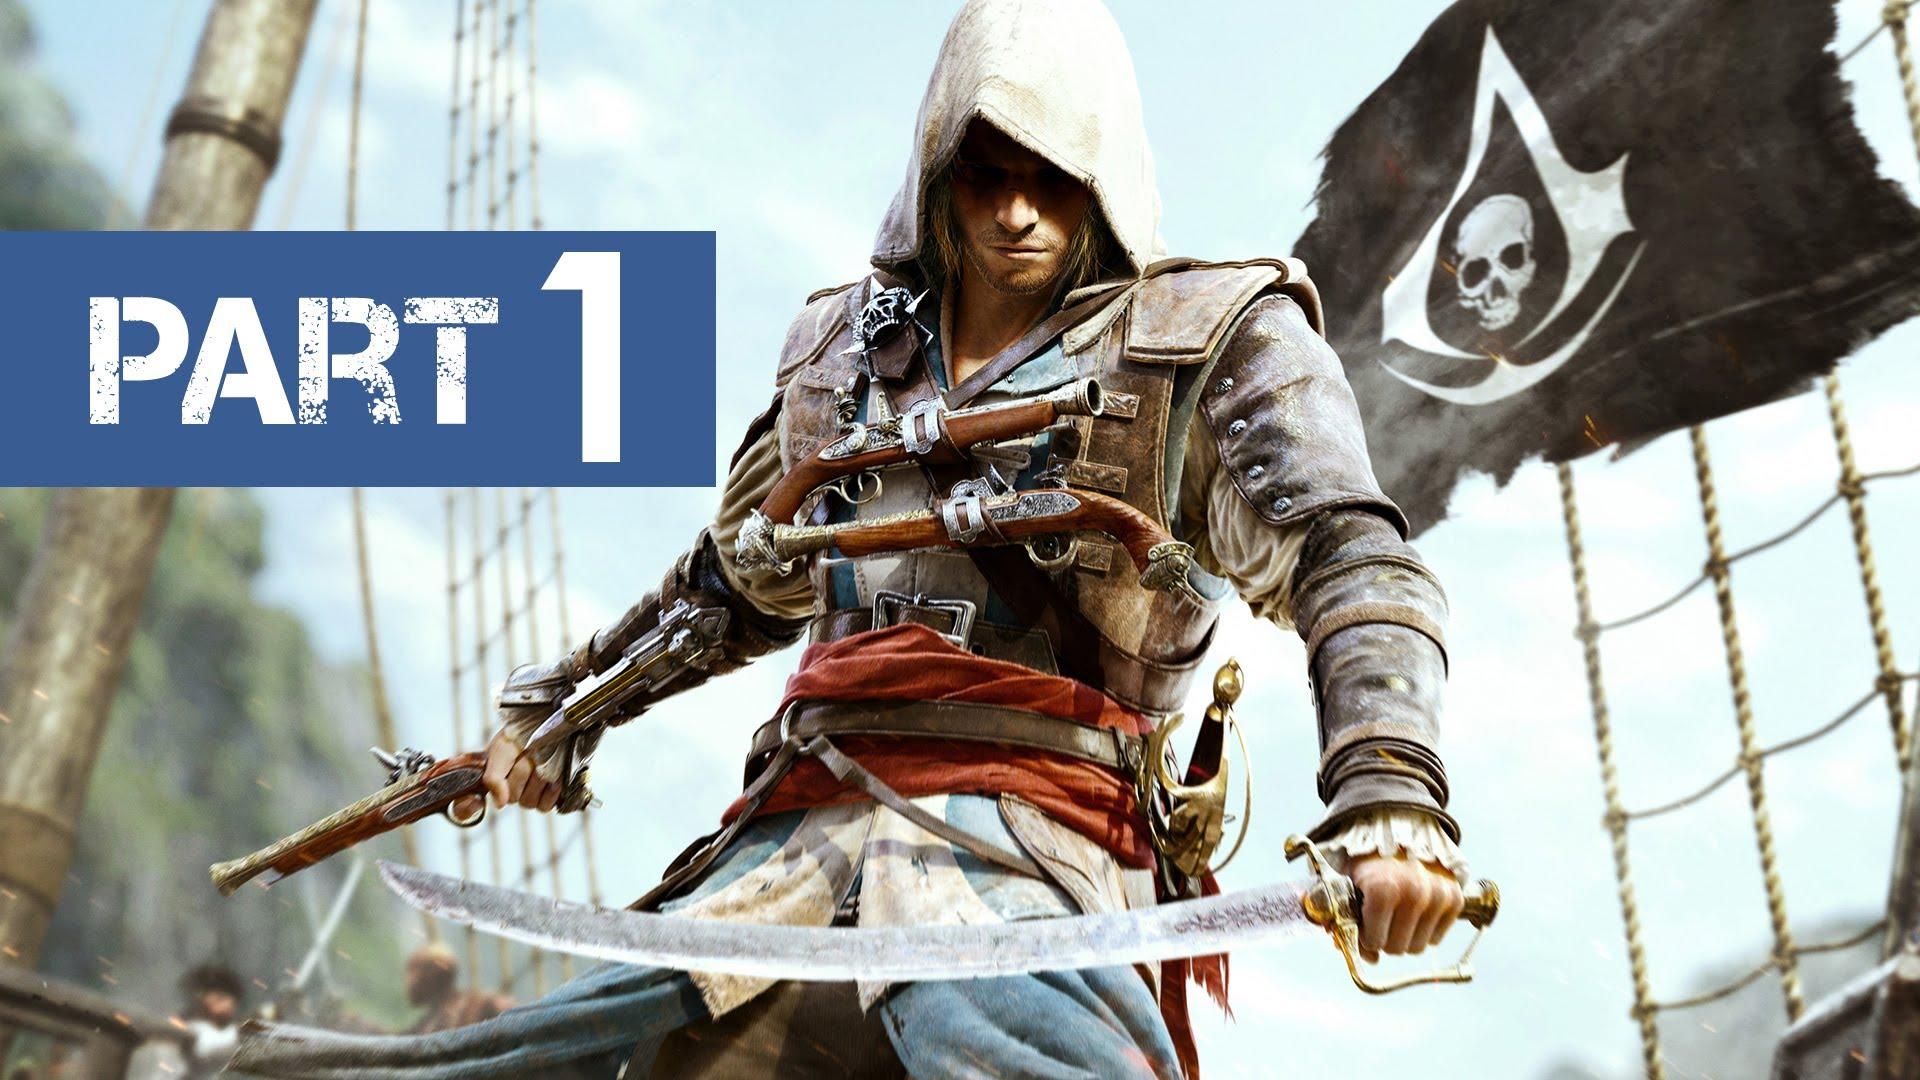 Assassins Creed Iv Black Flag Wallpaper 1920x1080 25277